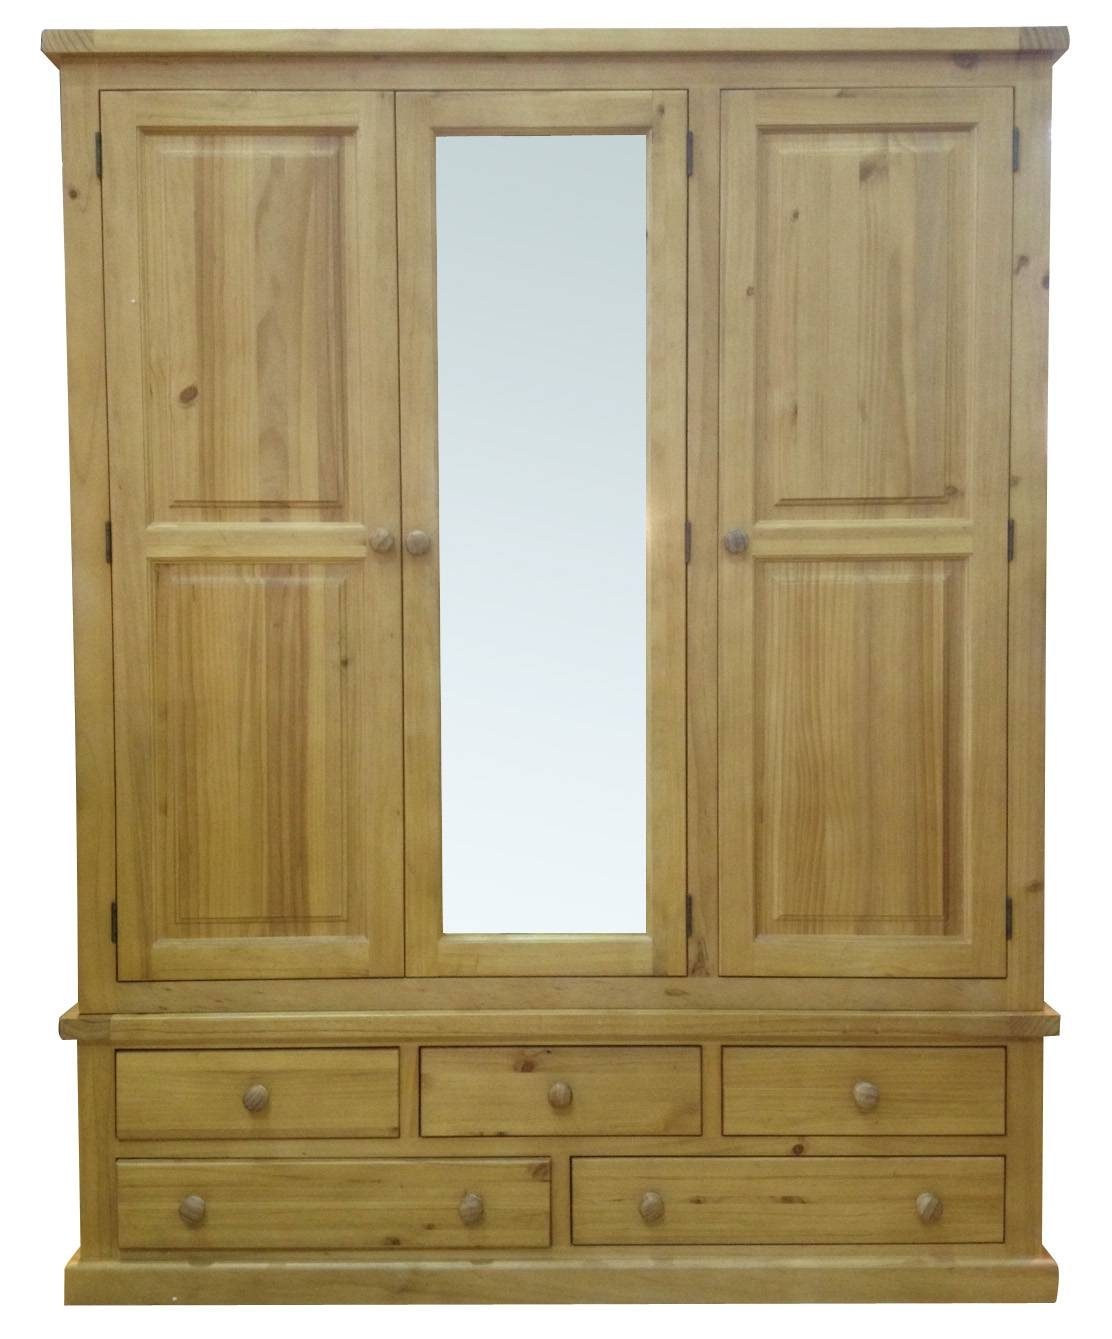 Cotham Large Mirrored 3 Door Pine Wardrobecotham Large Mirrored 3 For 3 Door Pine Wardrobes (View 6 of 15)